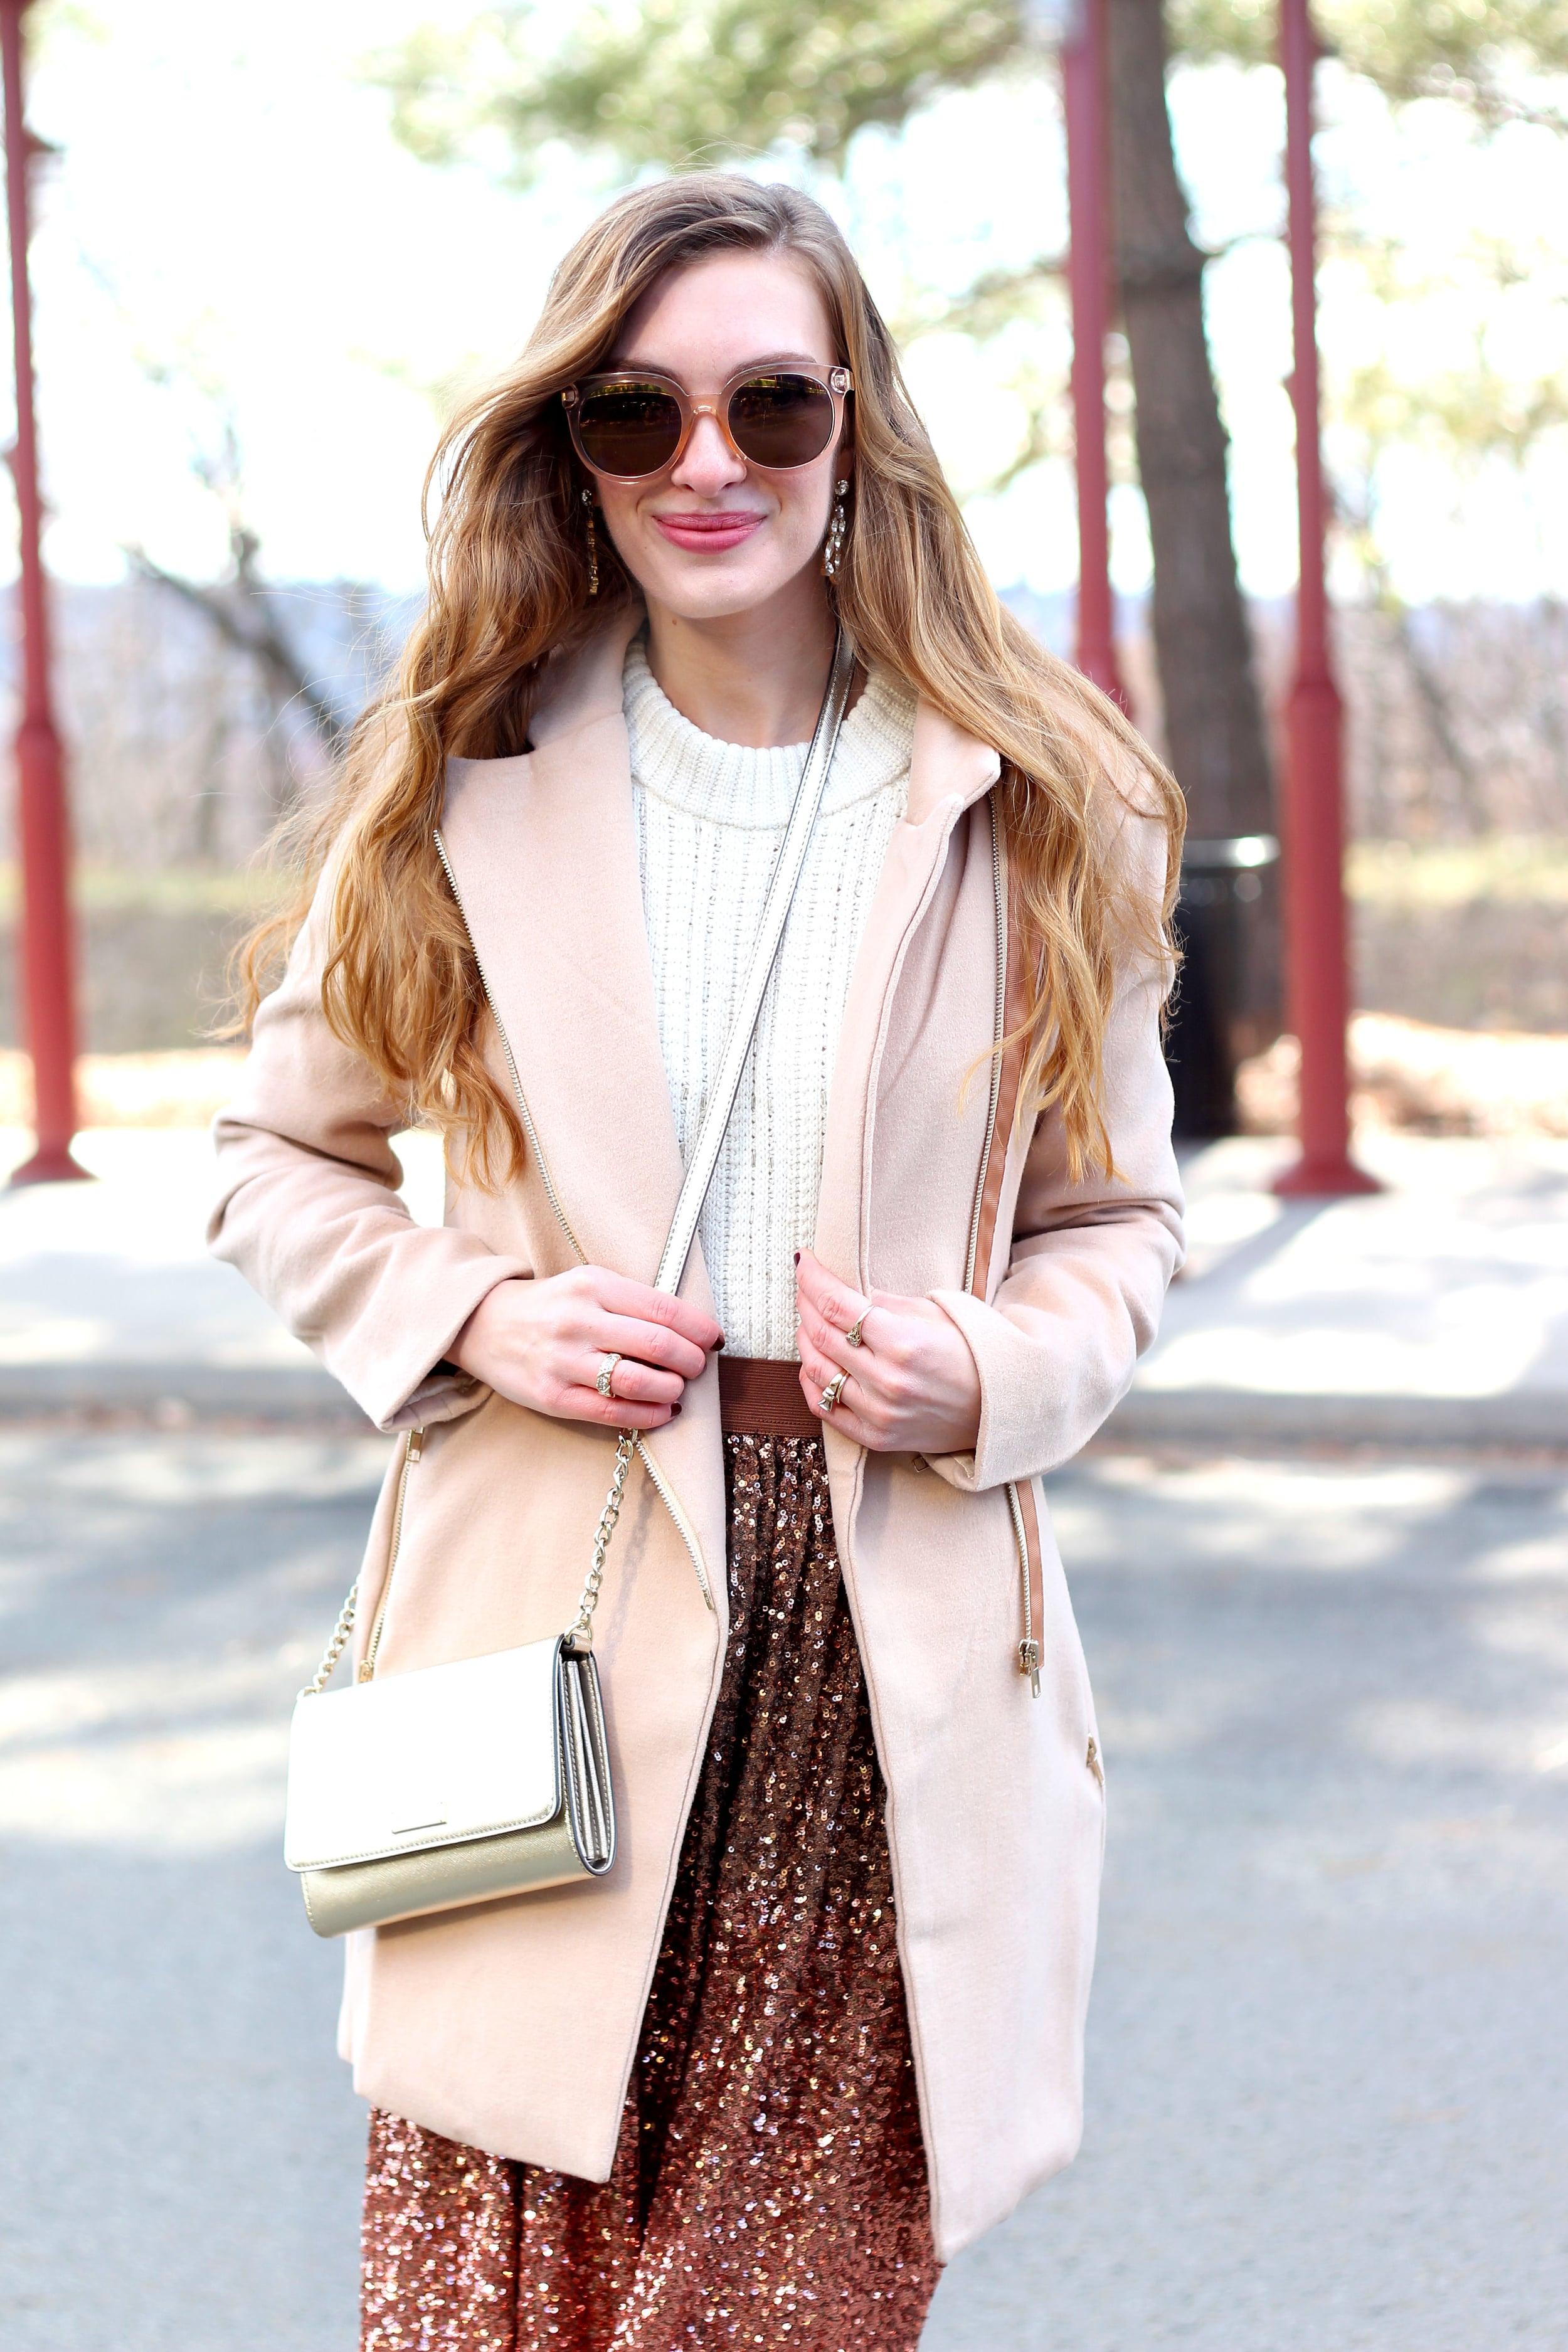 Sequin Skirt- Enchanting EleganceSequin Skirt- Enchanting Elegance